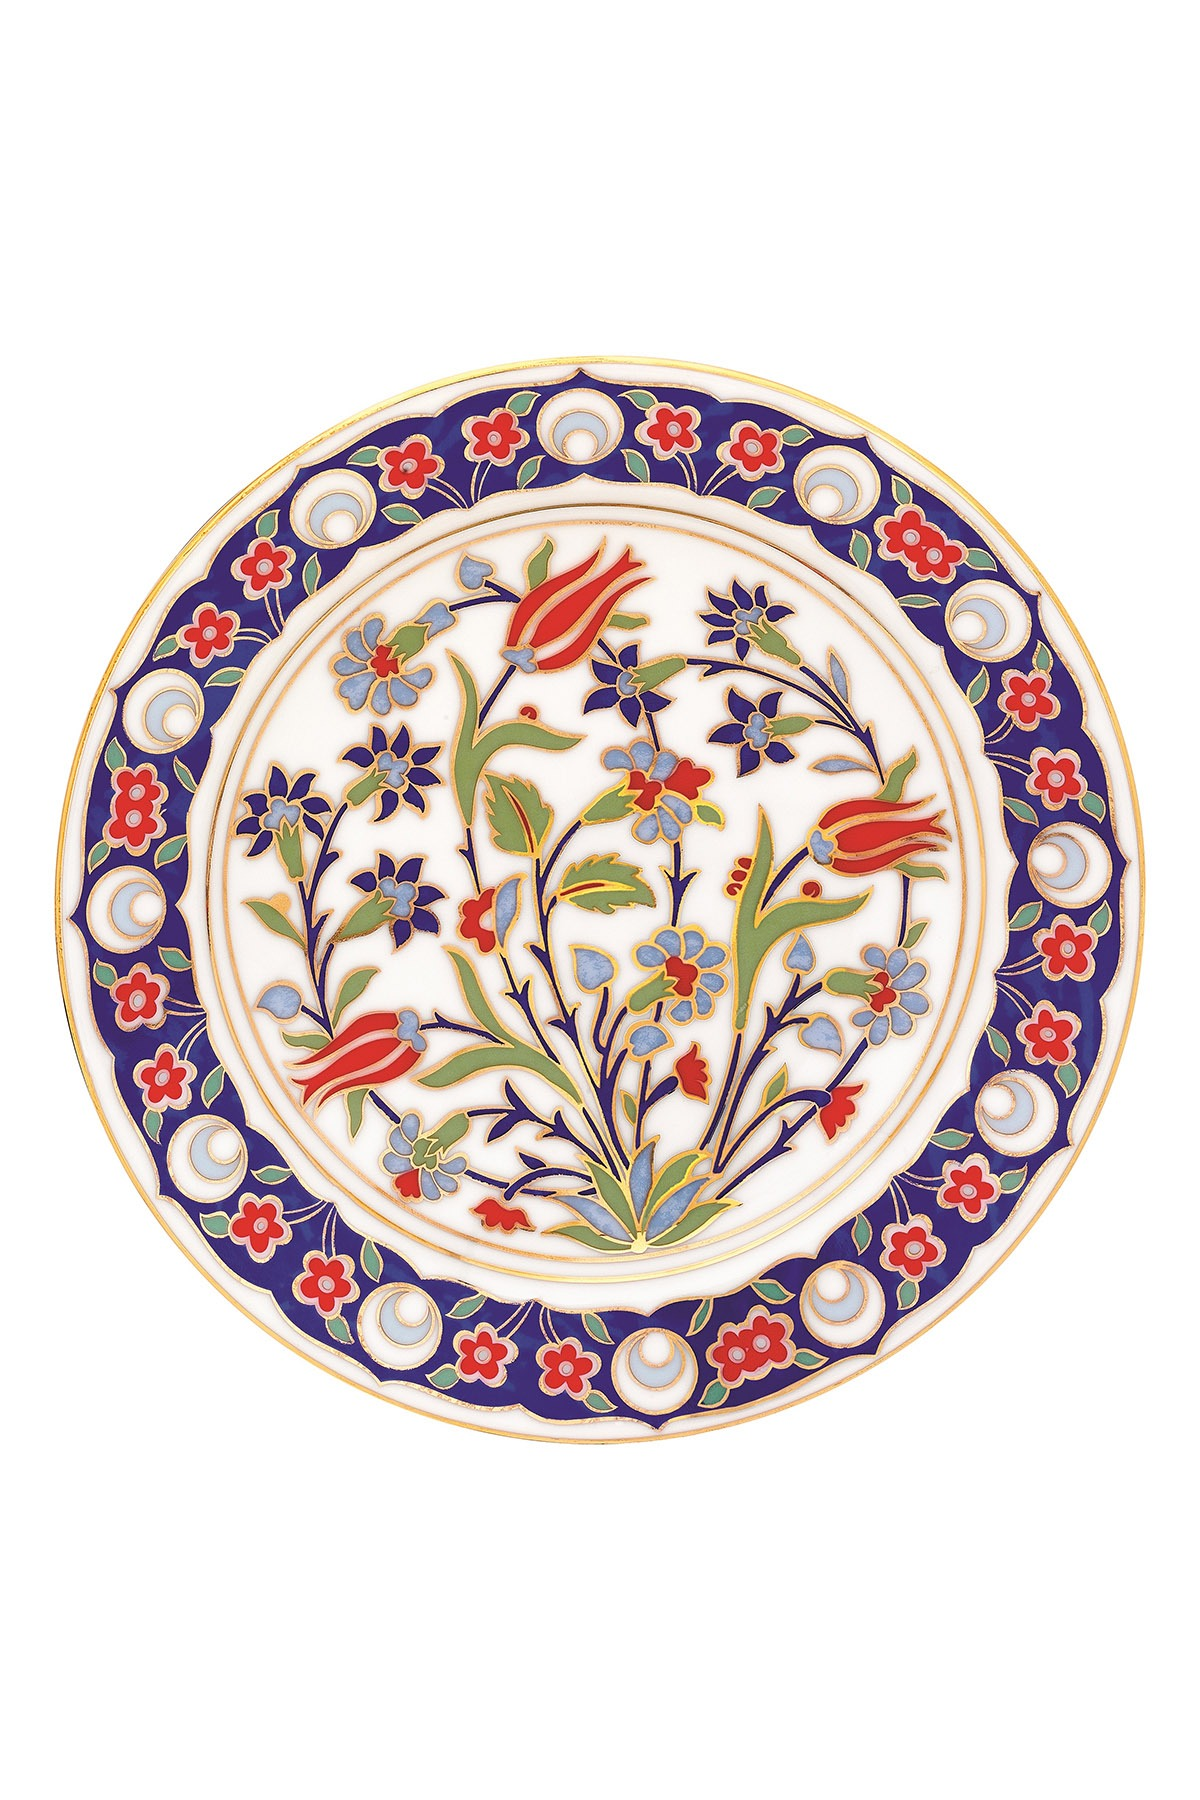 Kütahya Porselen - Kütahya Porselen Lenger 25 Cm Duvar Tabağı Dekor No:136